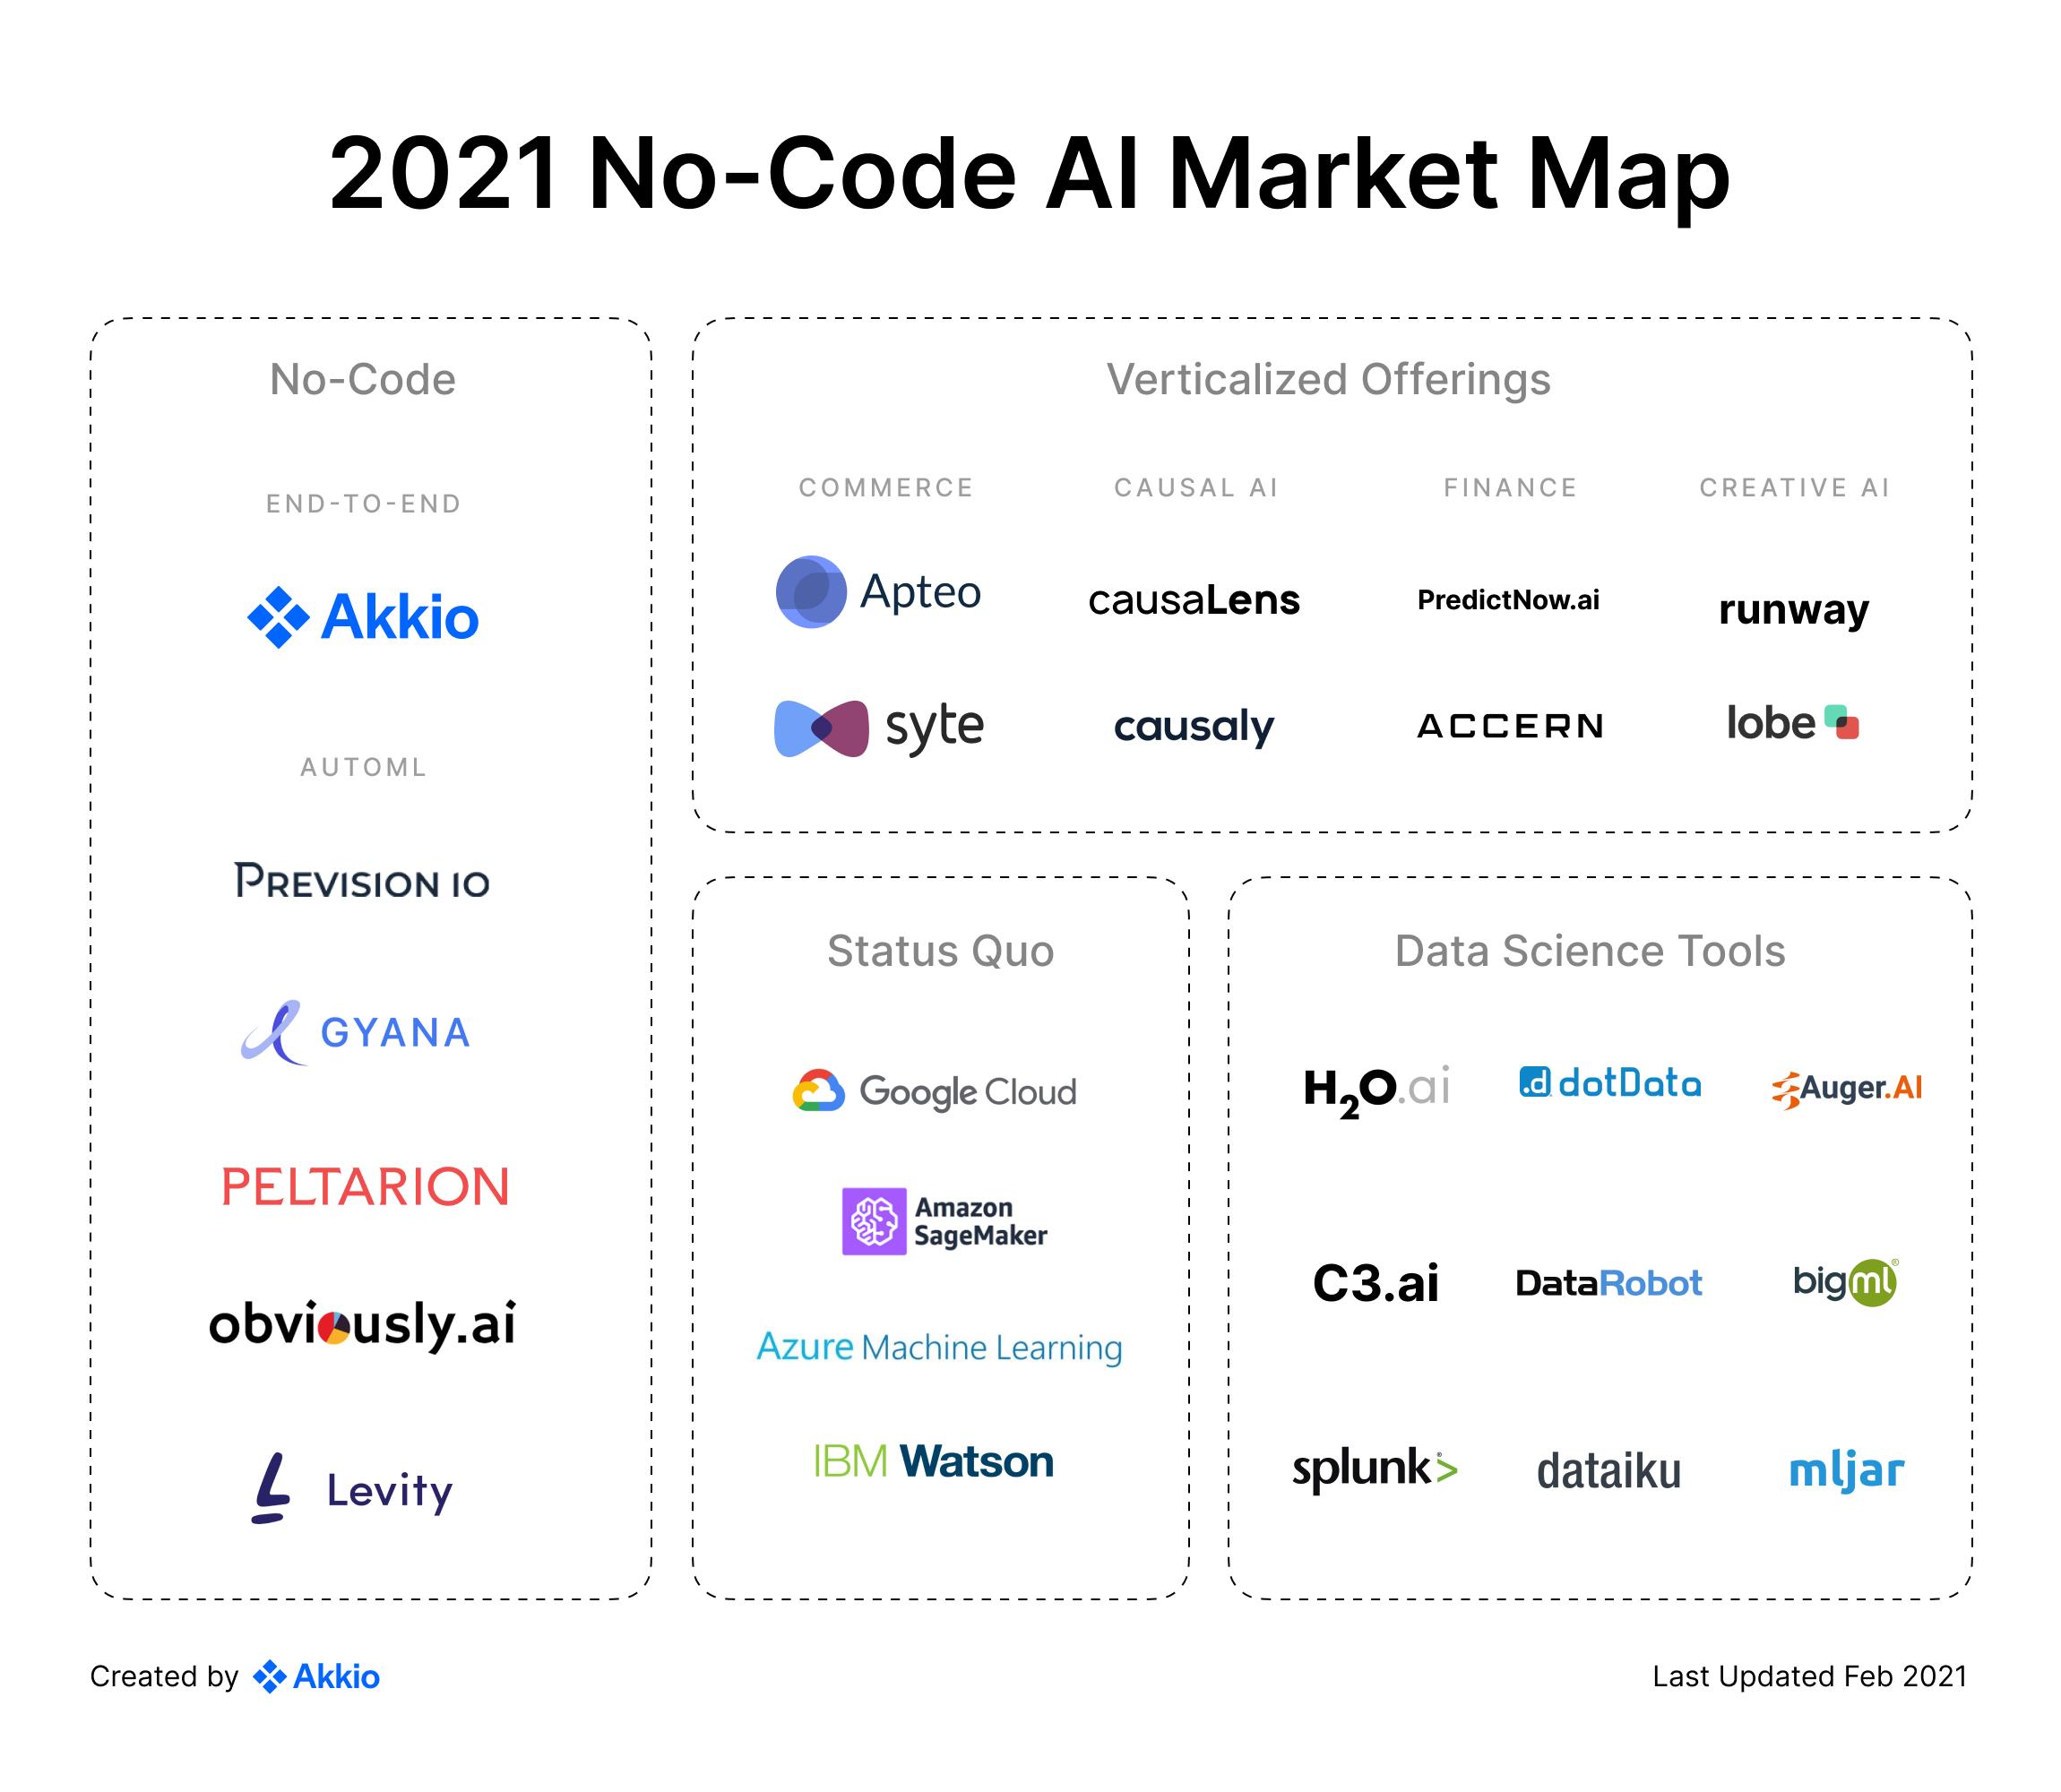 No-Code AI Market Map 2021